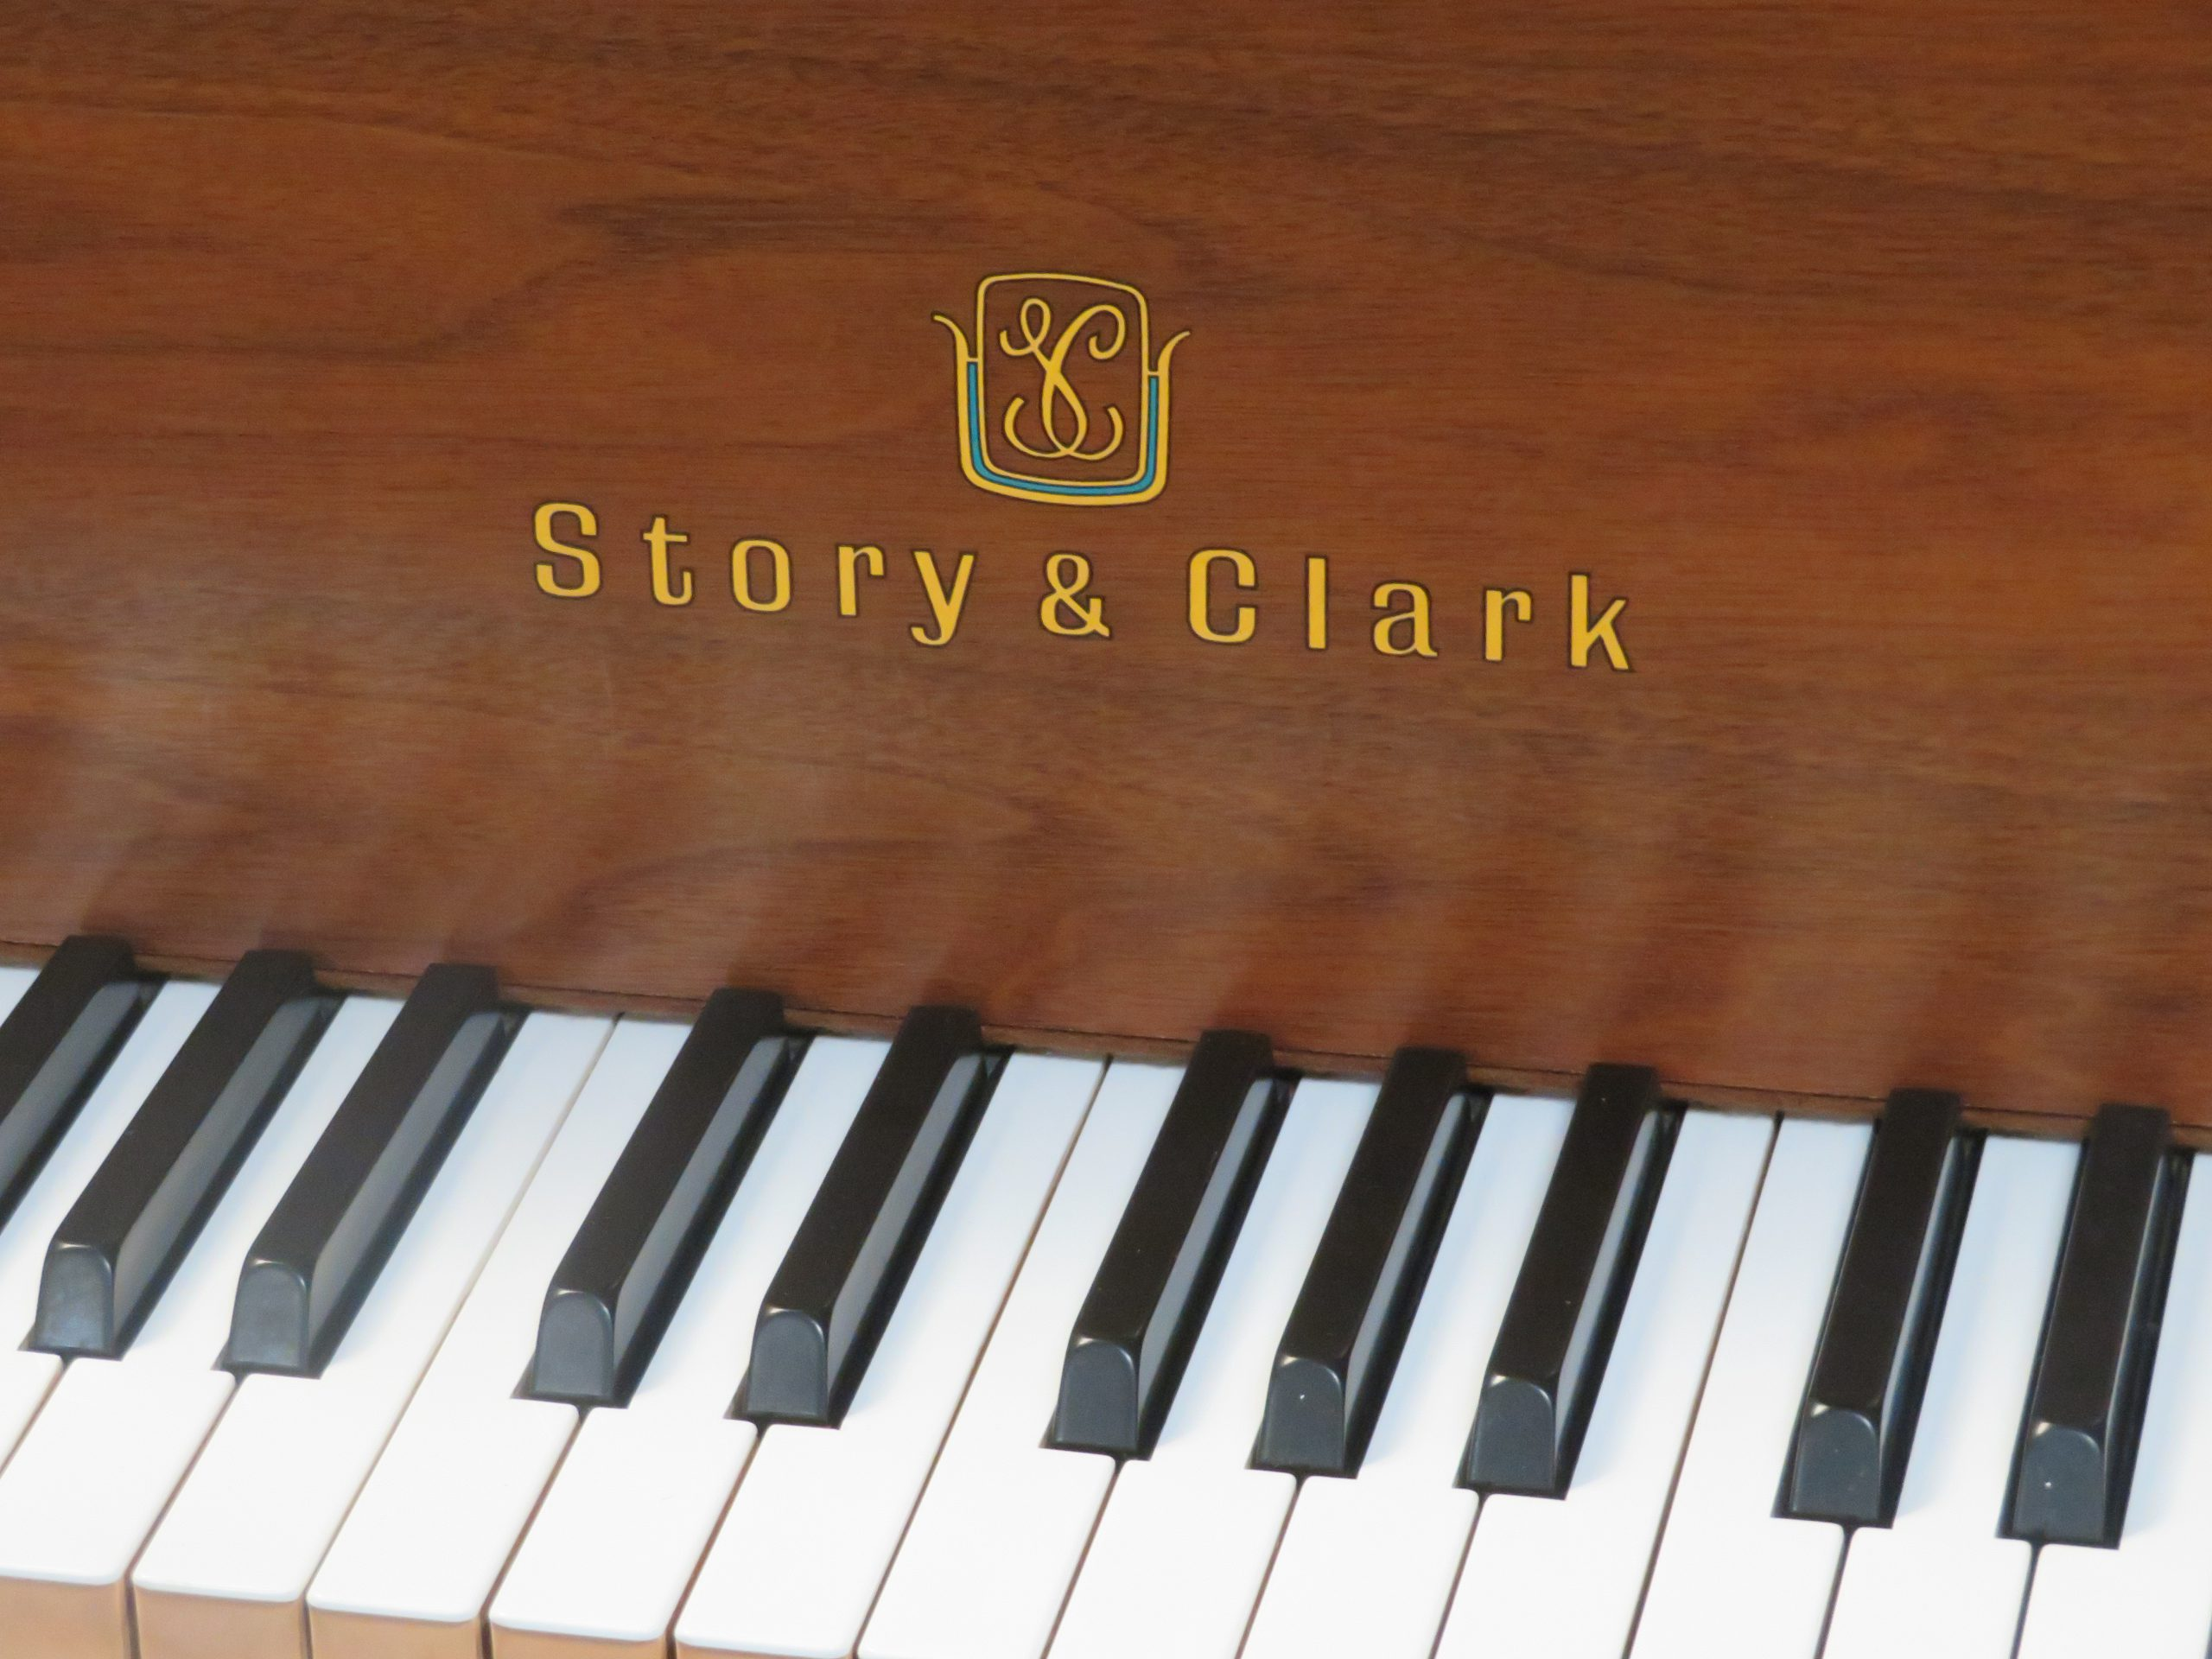 "12444-<br><font color=black><b>STORY & CLARK ""Built By Yamaha""</b></font> 5'3″ Grand Satin Walnut Excellent<br><font color=blue><b>Click Picture for ""Live Video""</b></font>"